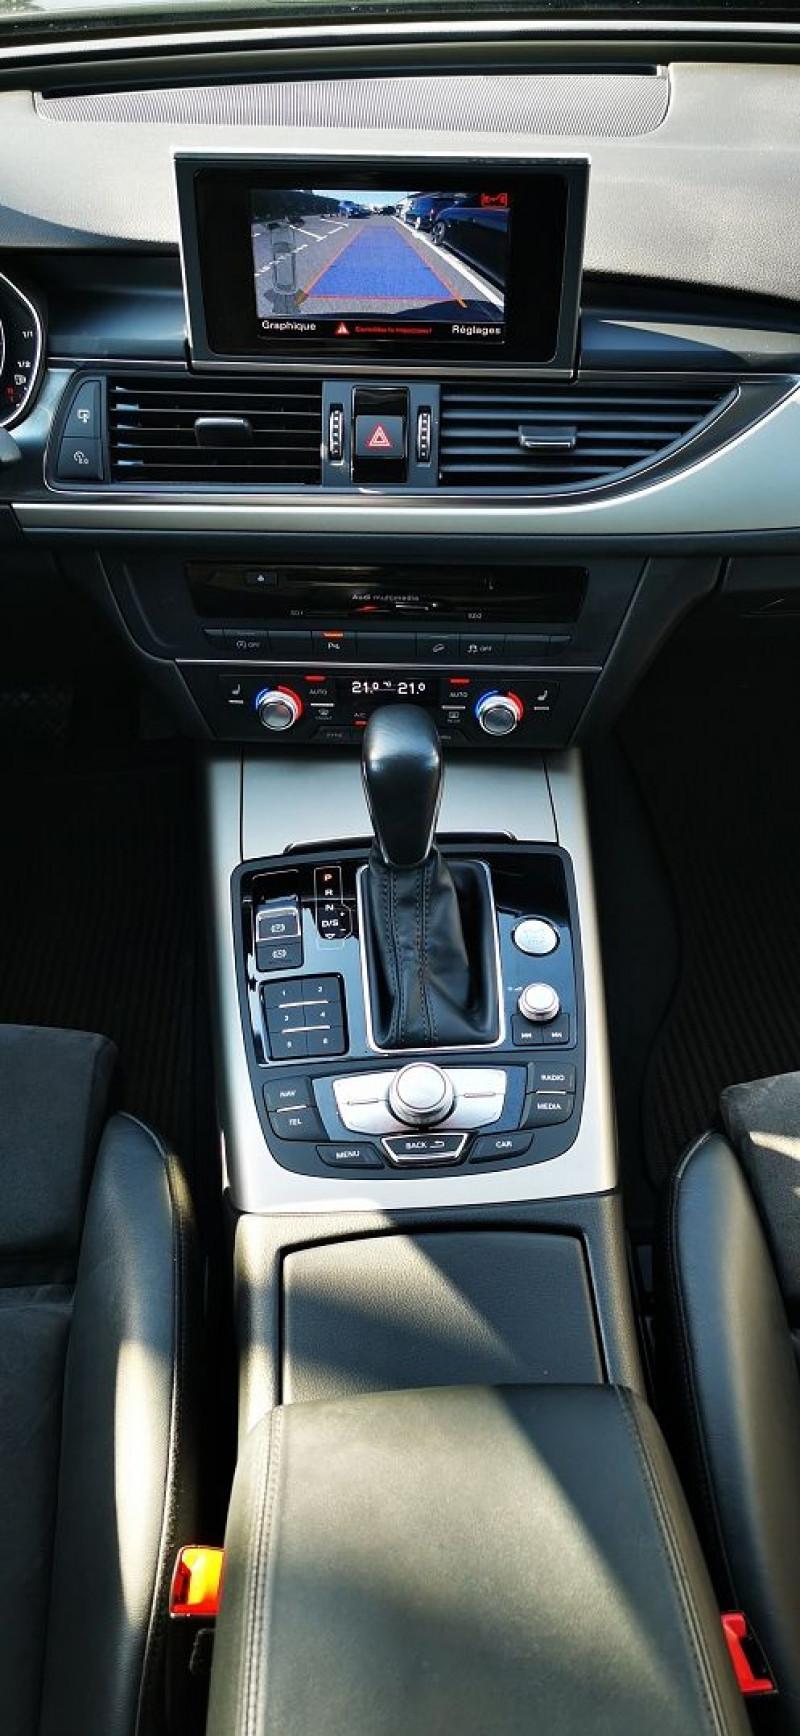 Photo 18 de l'offre de AUDI A6 ALLROAD 3.0 V6 BITDI 320CH AMBITION LUXE QUATTRO TIPTRONIC à 41490€ chez Maximum Automobiles